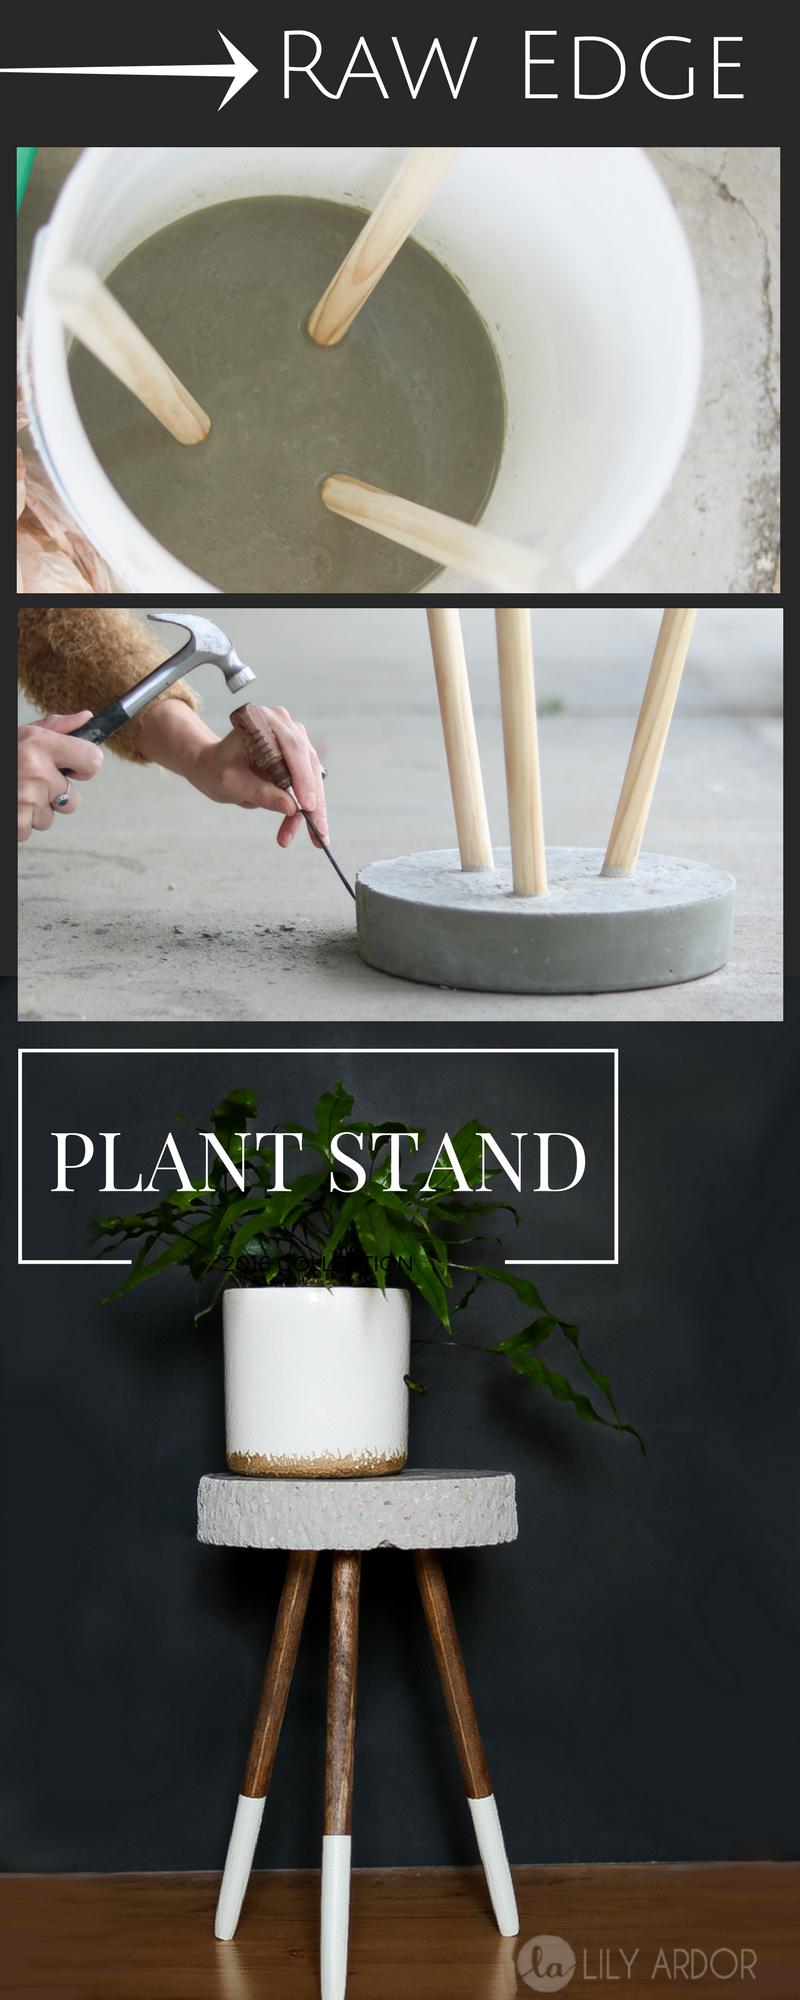 Raw Edge Concrete Plant Stand  DIY  TUTORIAL